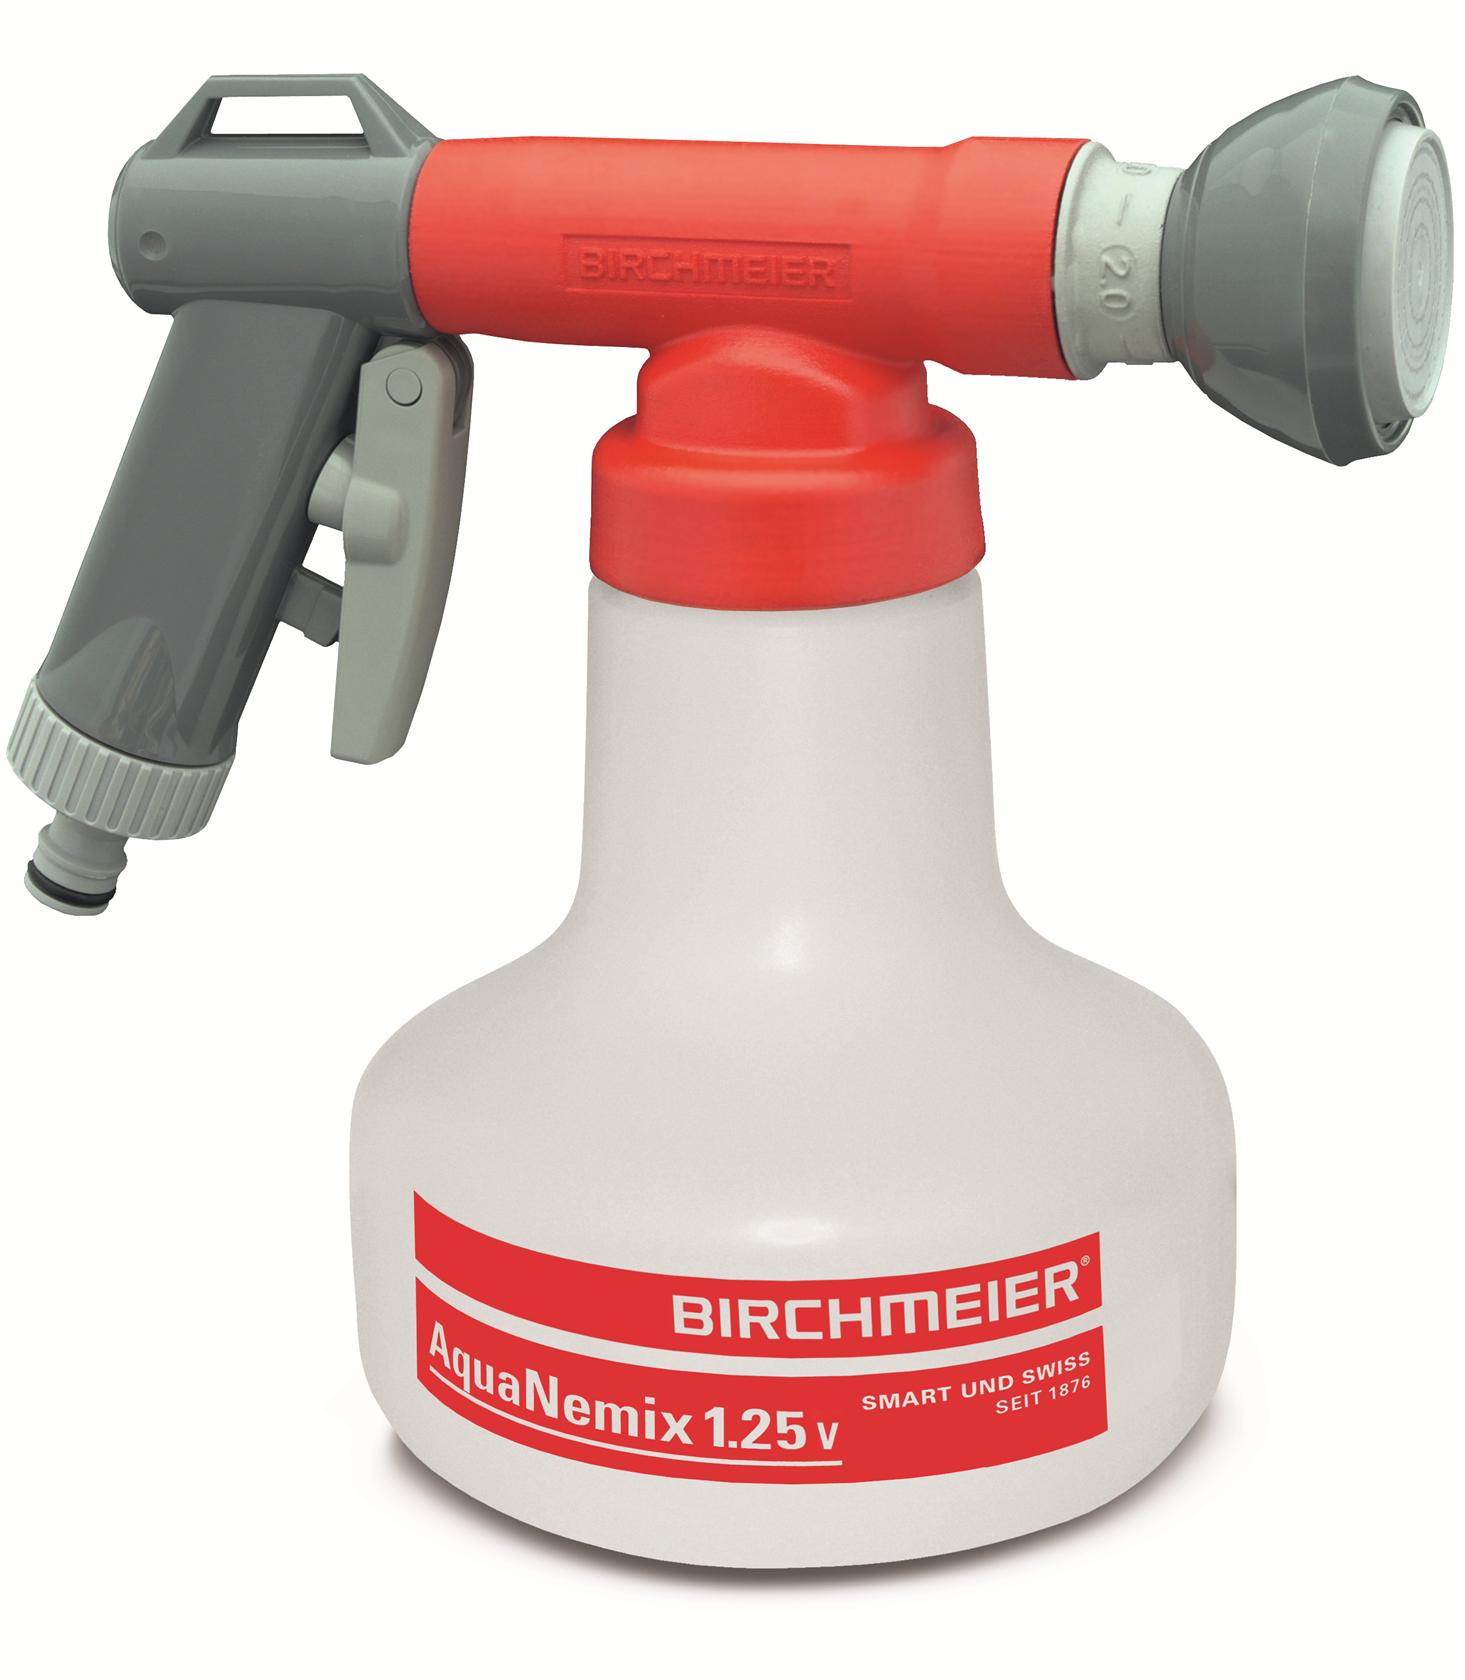 BIRCHMEIER-AQUANEMIX-125-V-1st